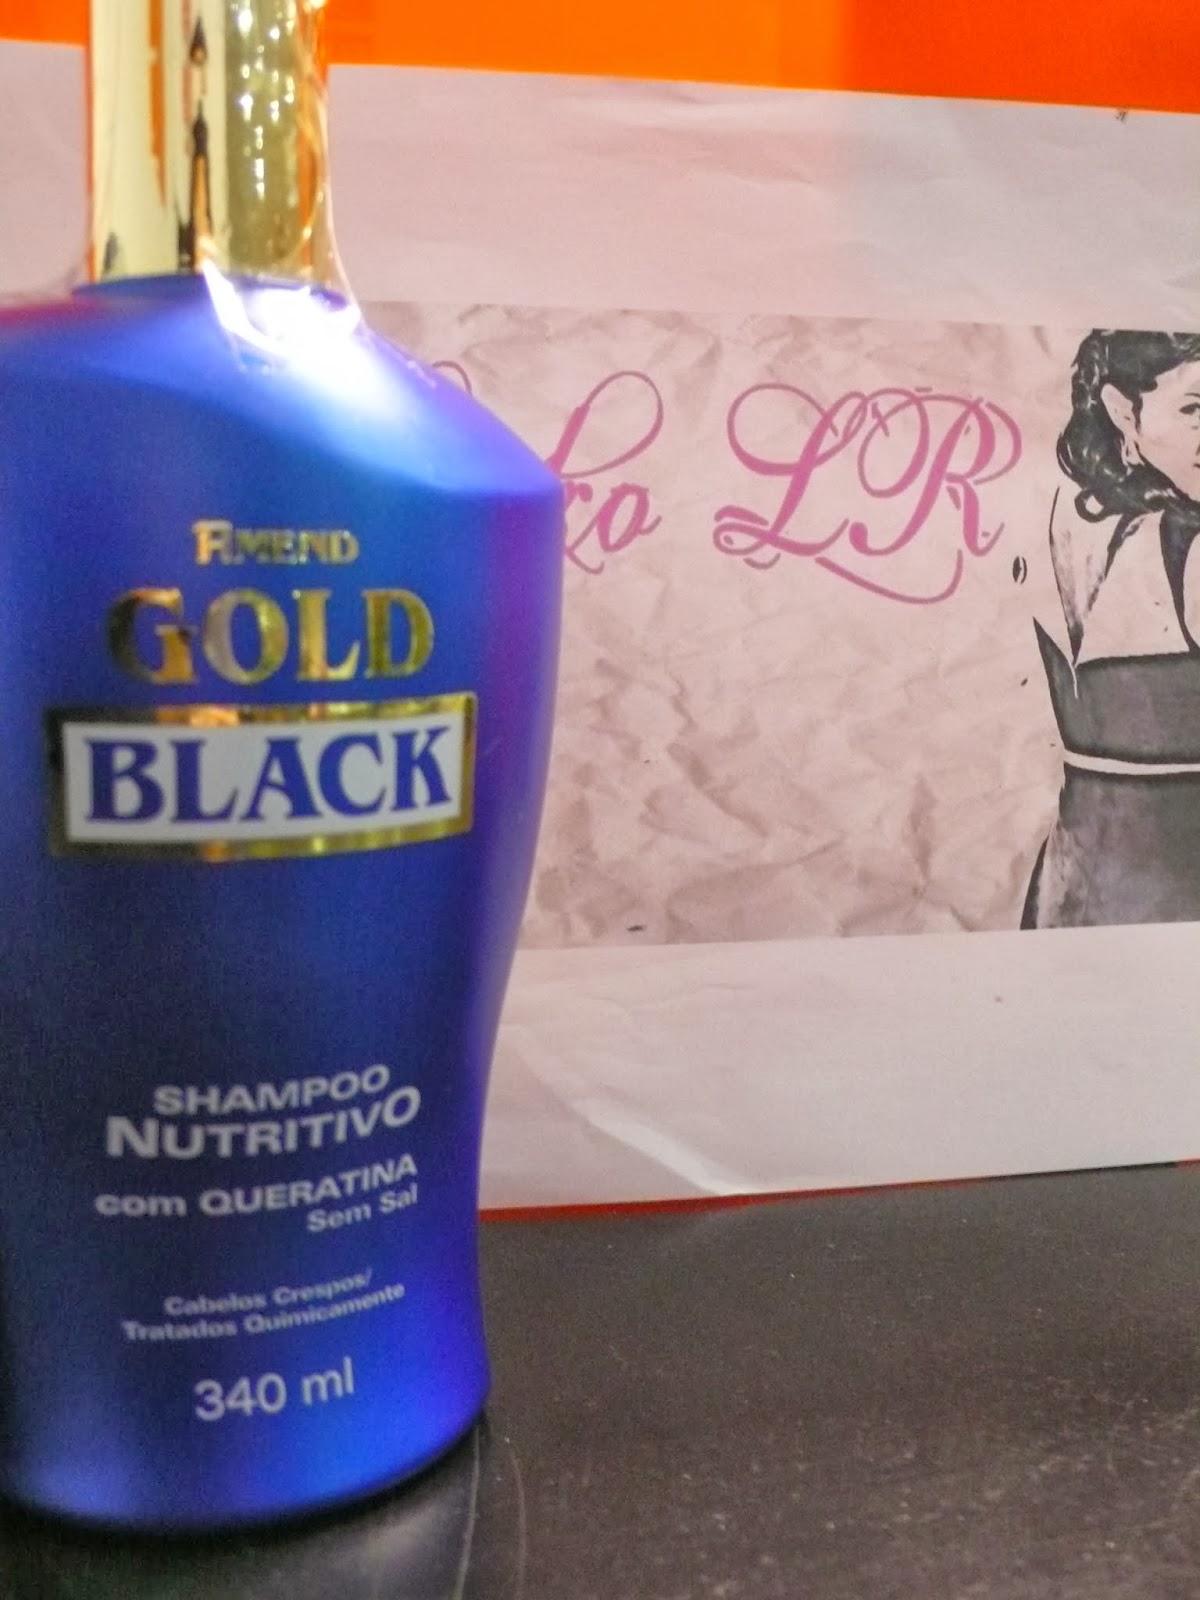 http://www.brasilybelleza.com/Amend-Champu-Nutritivo-Gold-Black-Queratina-340ml.html